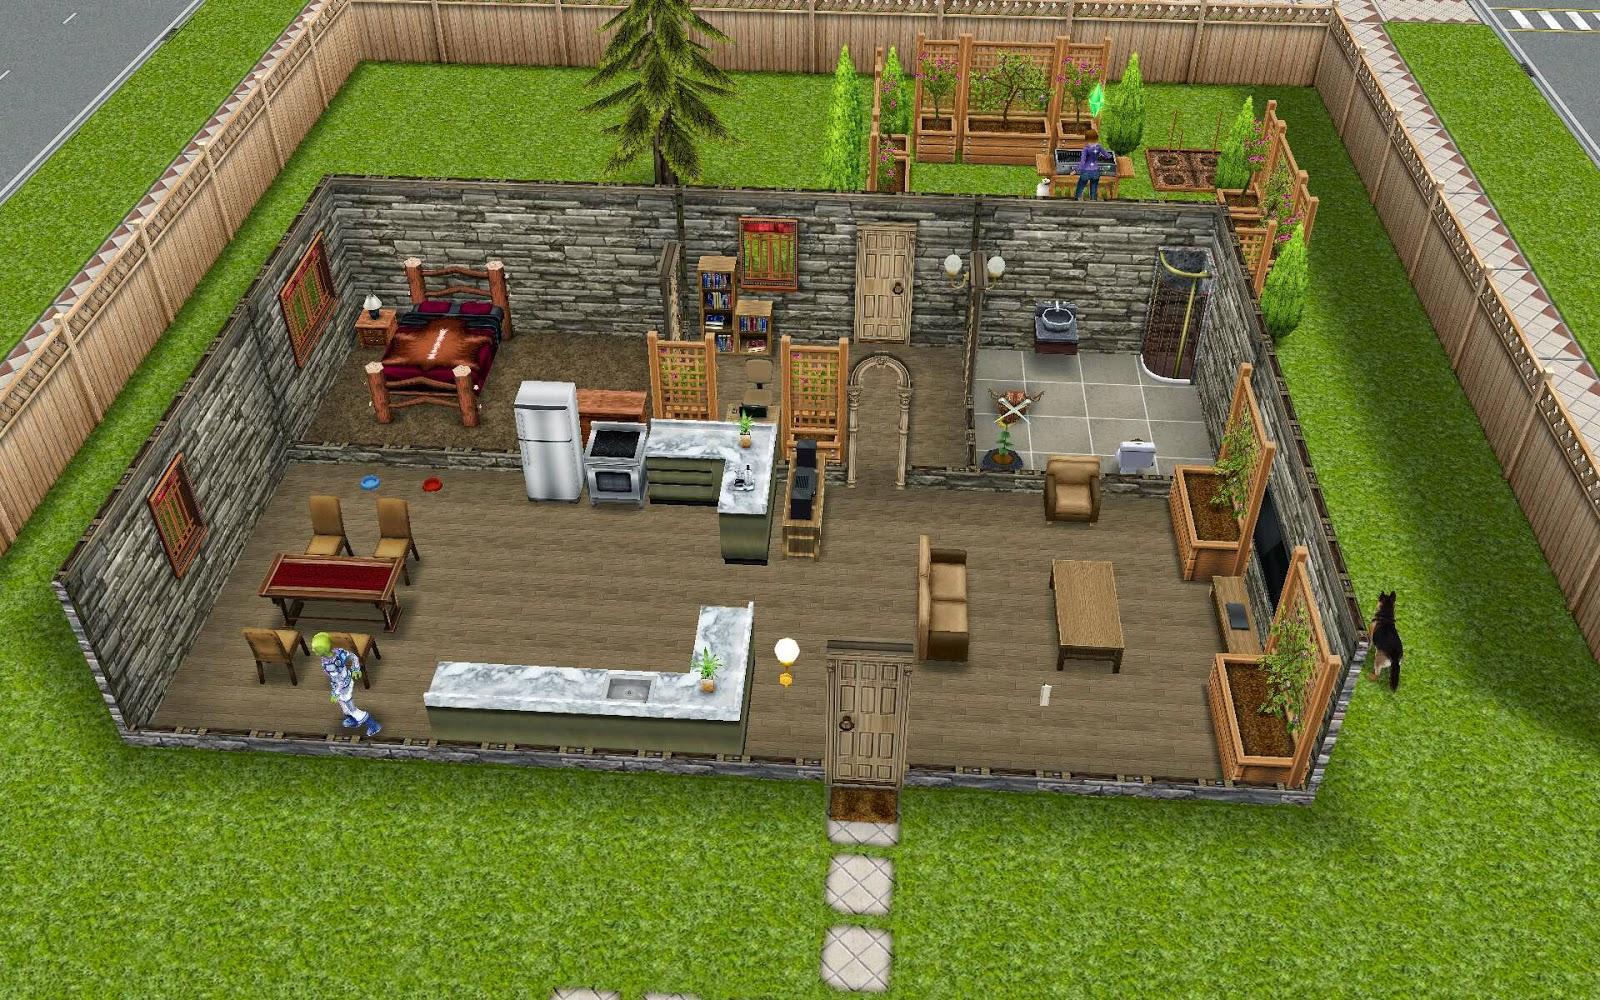 House Design Games App Sims Freeplay Housing Minimalist